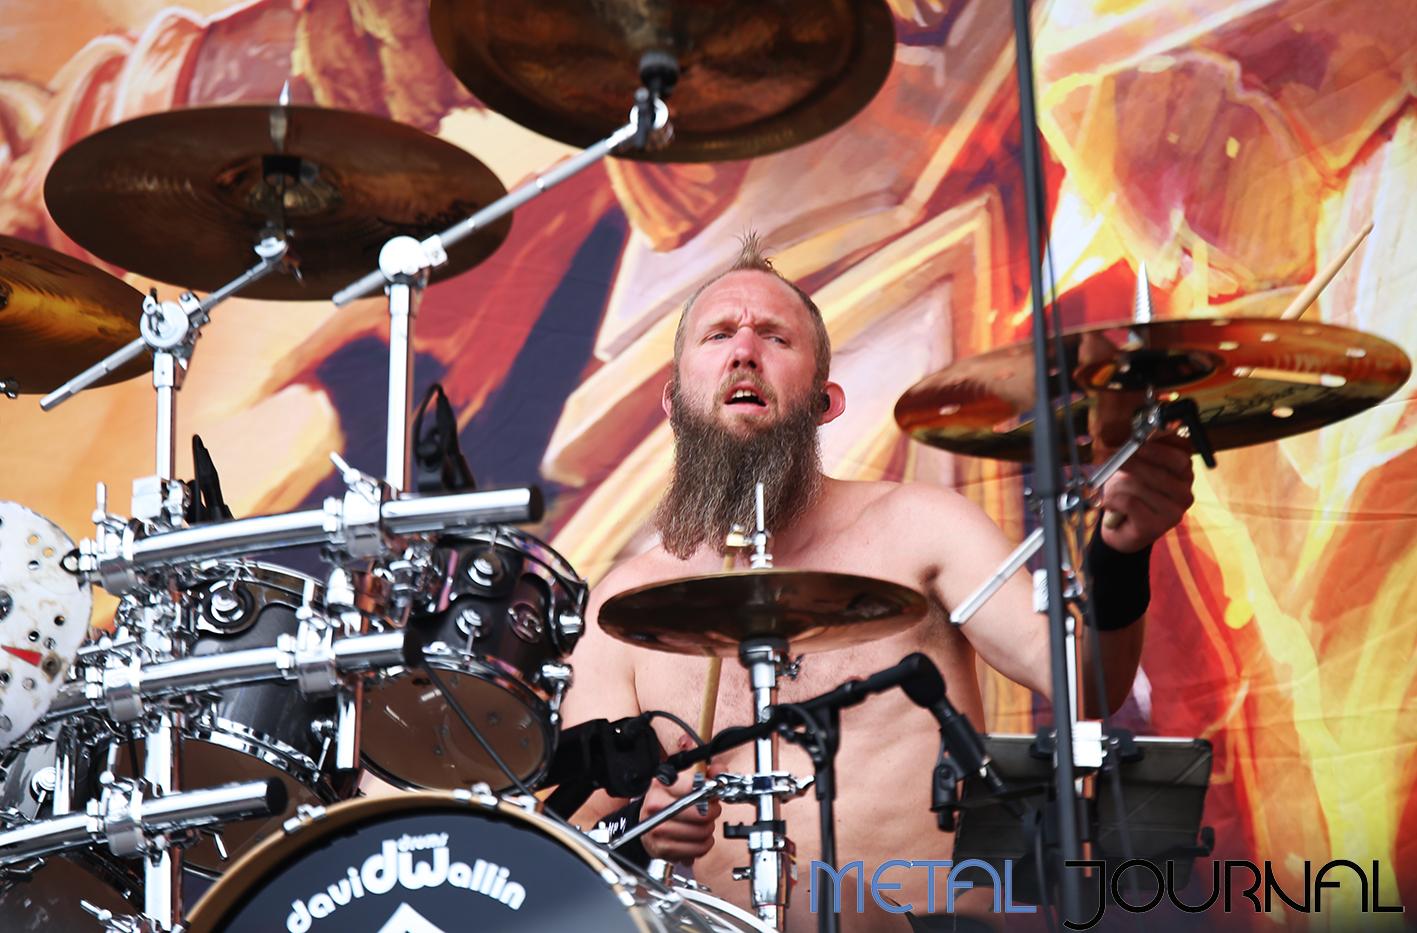 hammerfall - metal journal rock fest barcelona 2019 pic 8